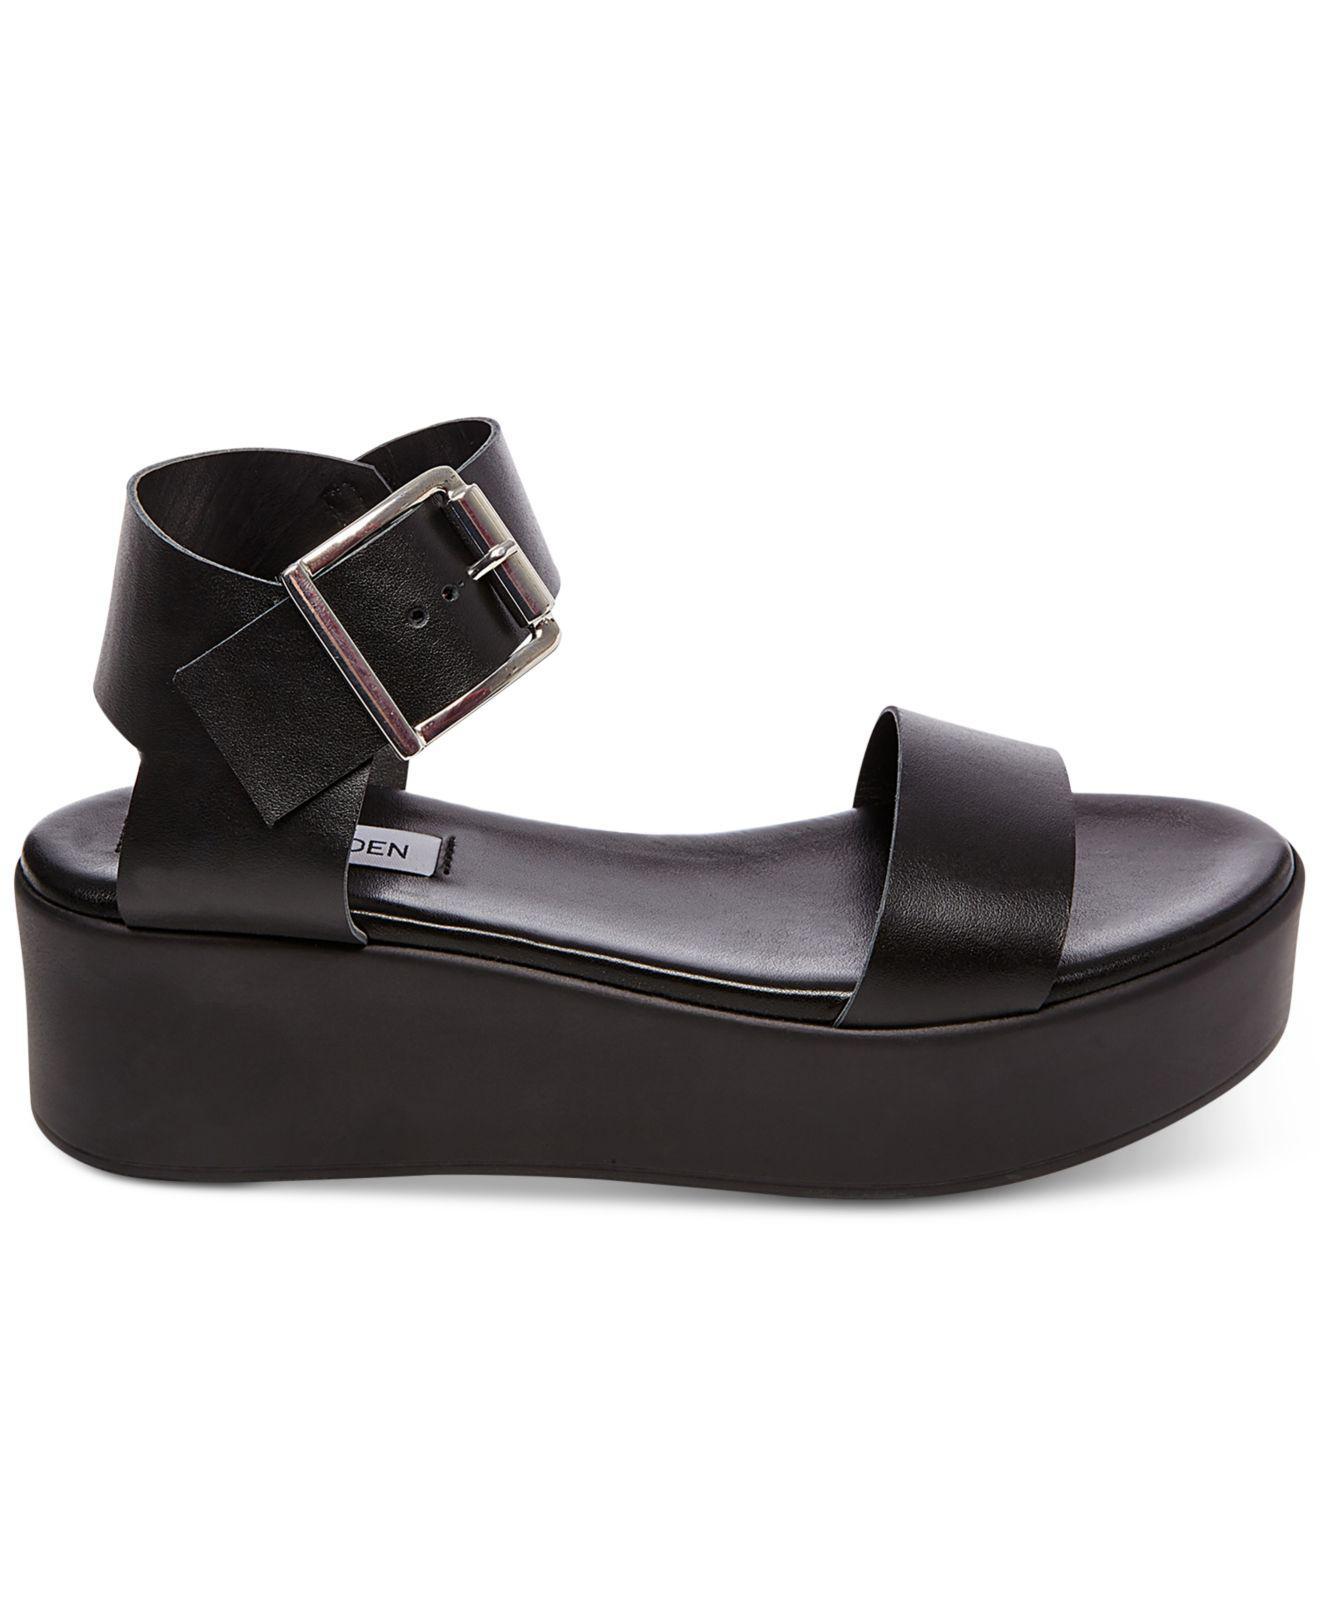 13294e7ce5d Steve Madden Black Recover Flatform Sandals